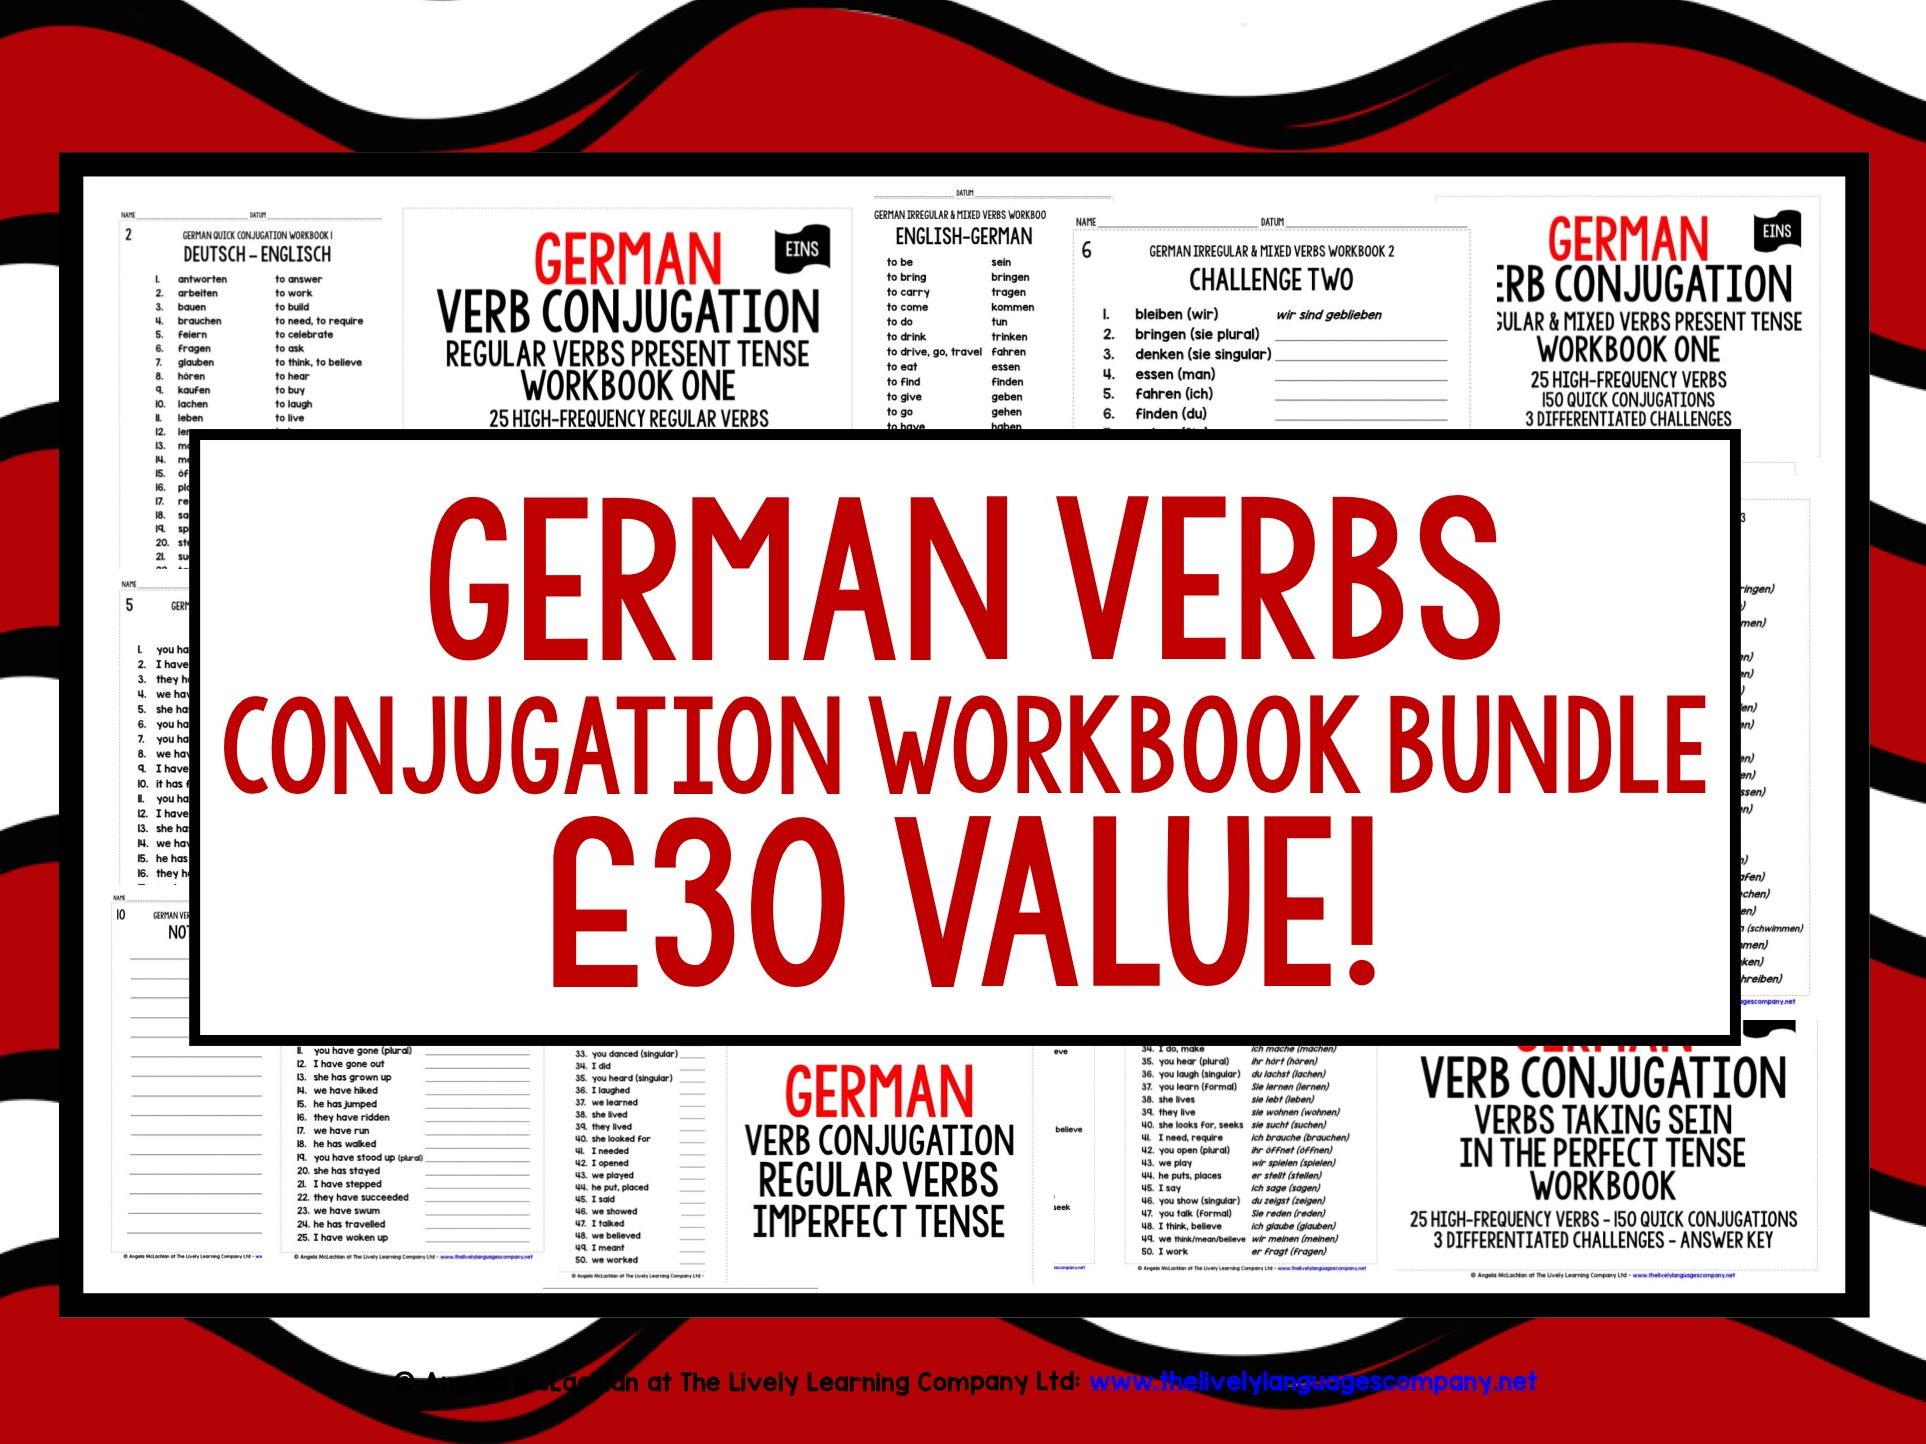 GERMAN VERBS CONJUGATION (1)